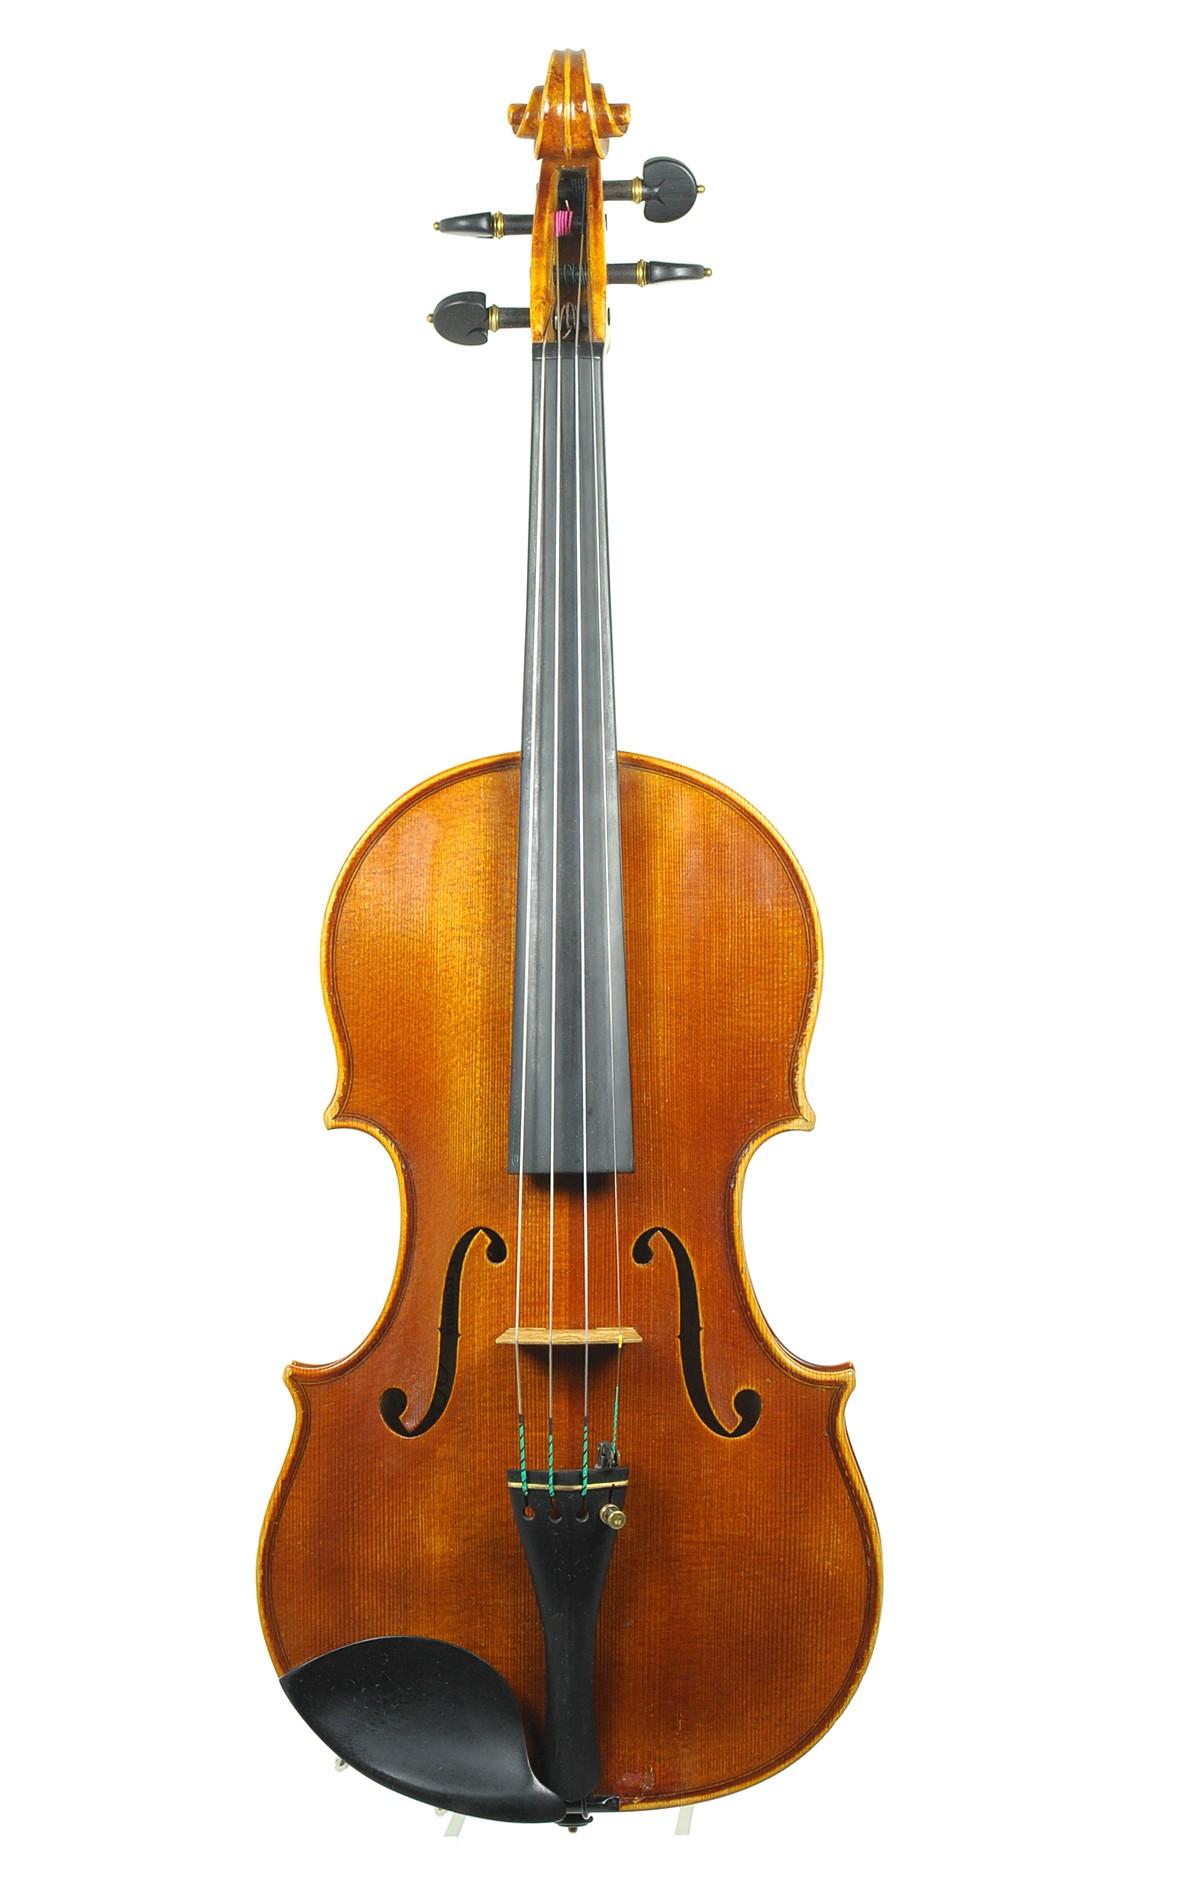 Contemporary Cremonese violin by Riccardo Bergonzi